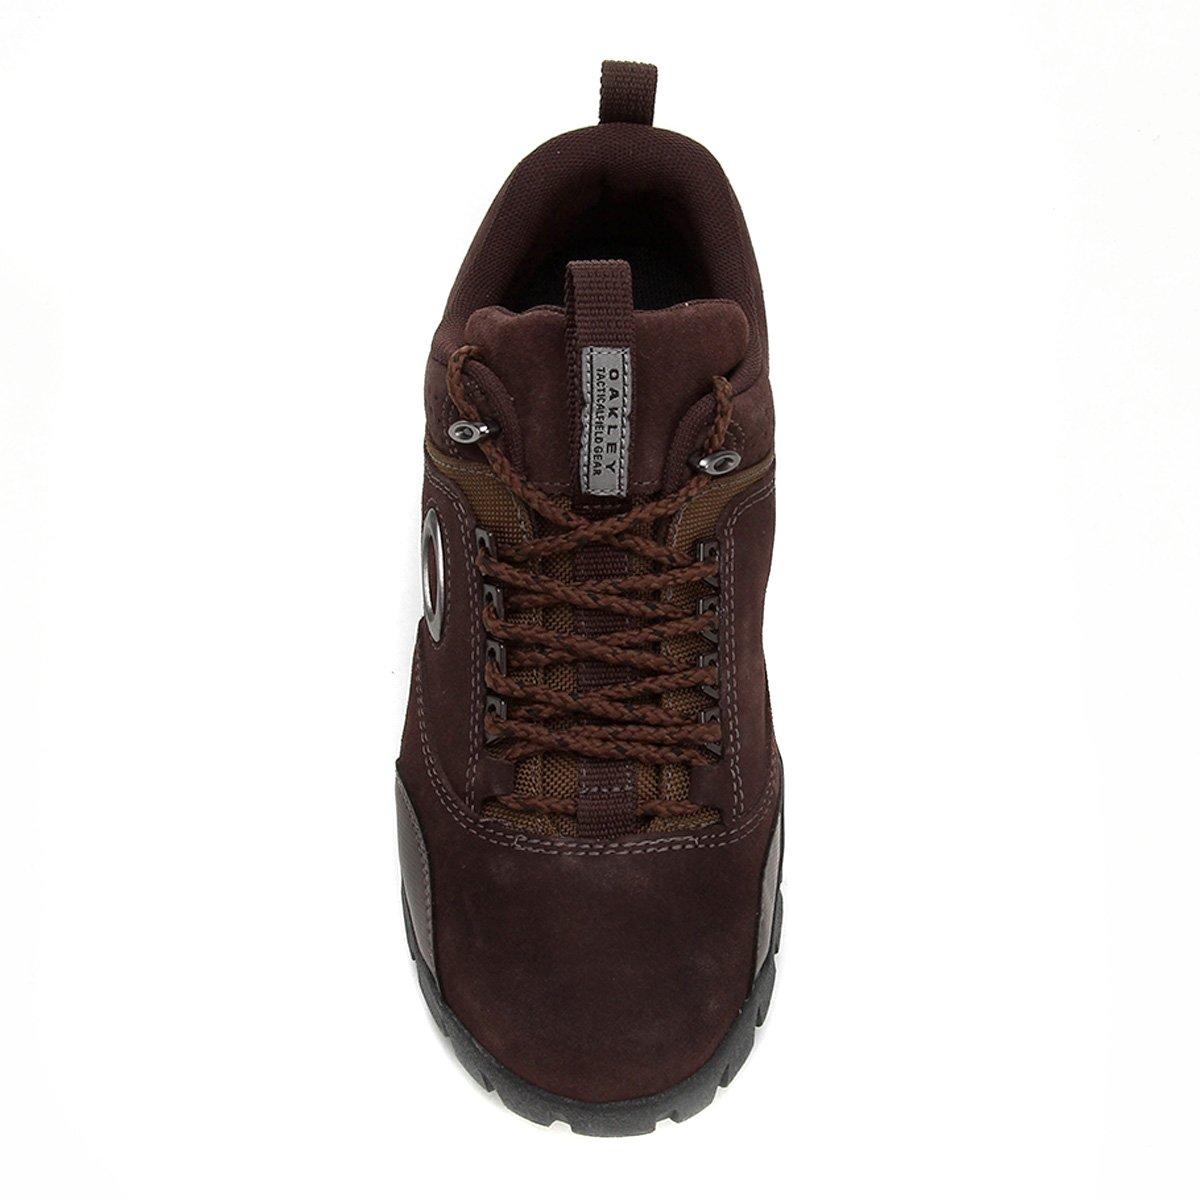 0e3b39269617d Low Netshoes Agora Oakley Masculino Modoc Tênis Compre Tqn8R7w6